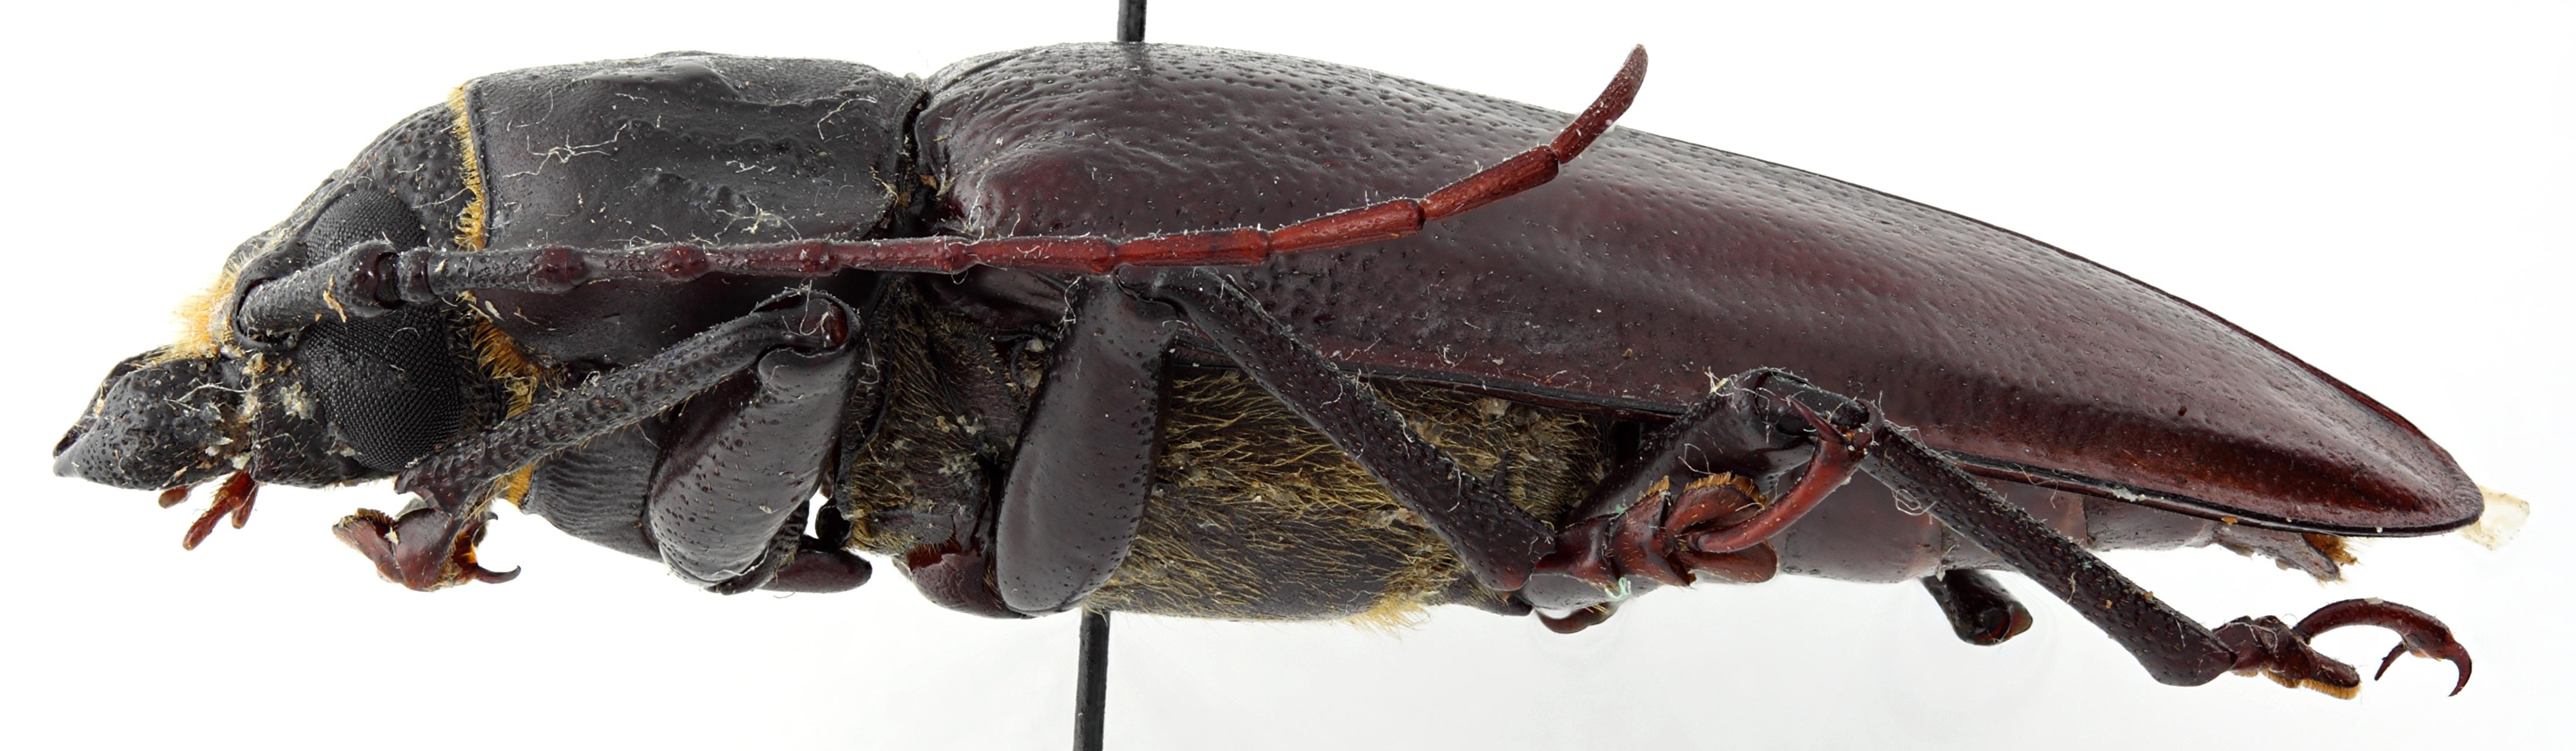 Olethrius tyrannus salomonum 01 BL Holotype M 042 BRUS 201405.jpg